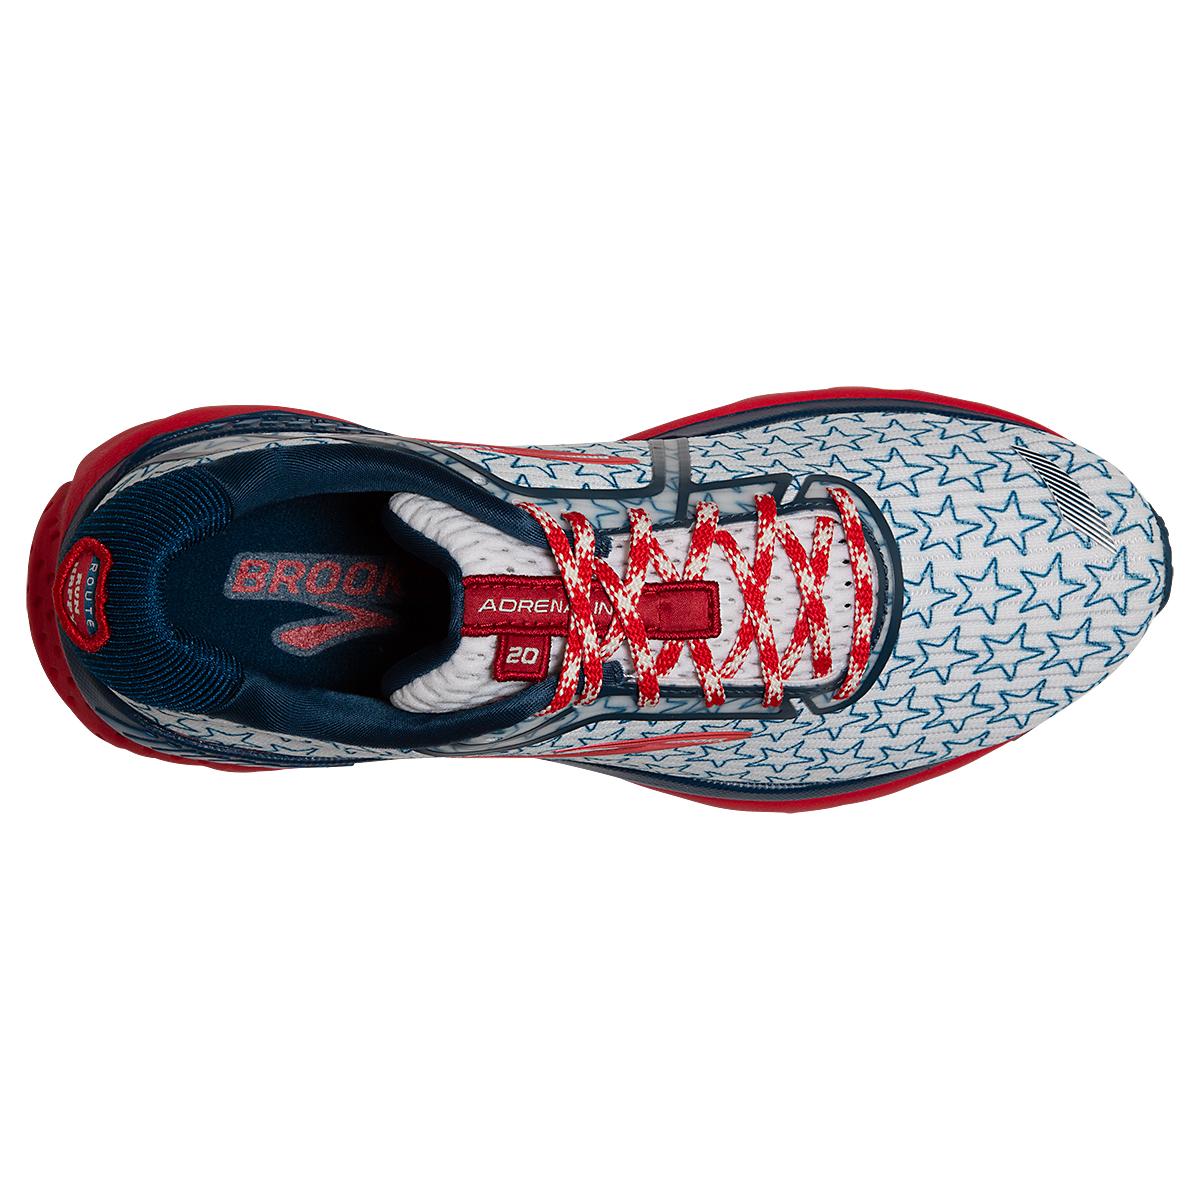 Women's Brooks Adrenaline GTS 20 Running Shoe - Color: White/Gibraltar - Size: 5 - Width: Regular, White/Gibraltar, large, image 2